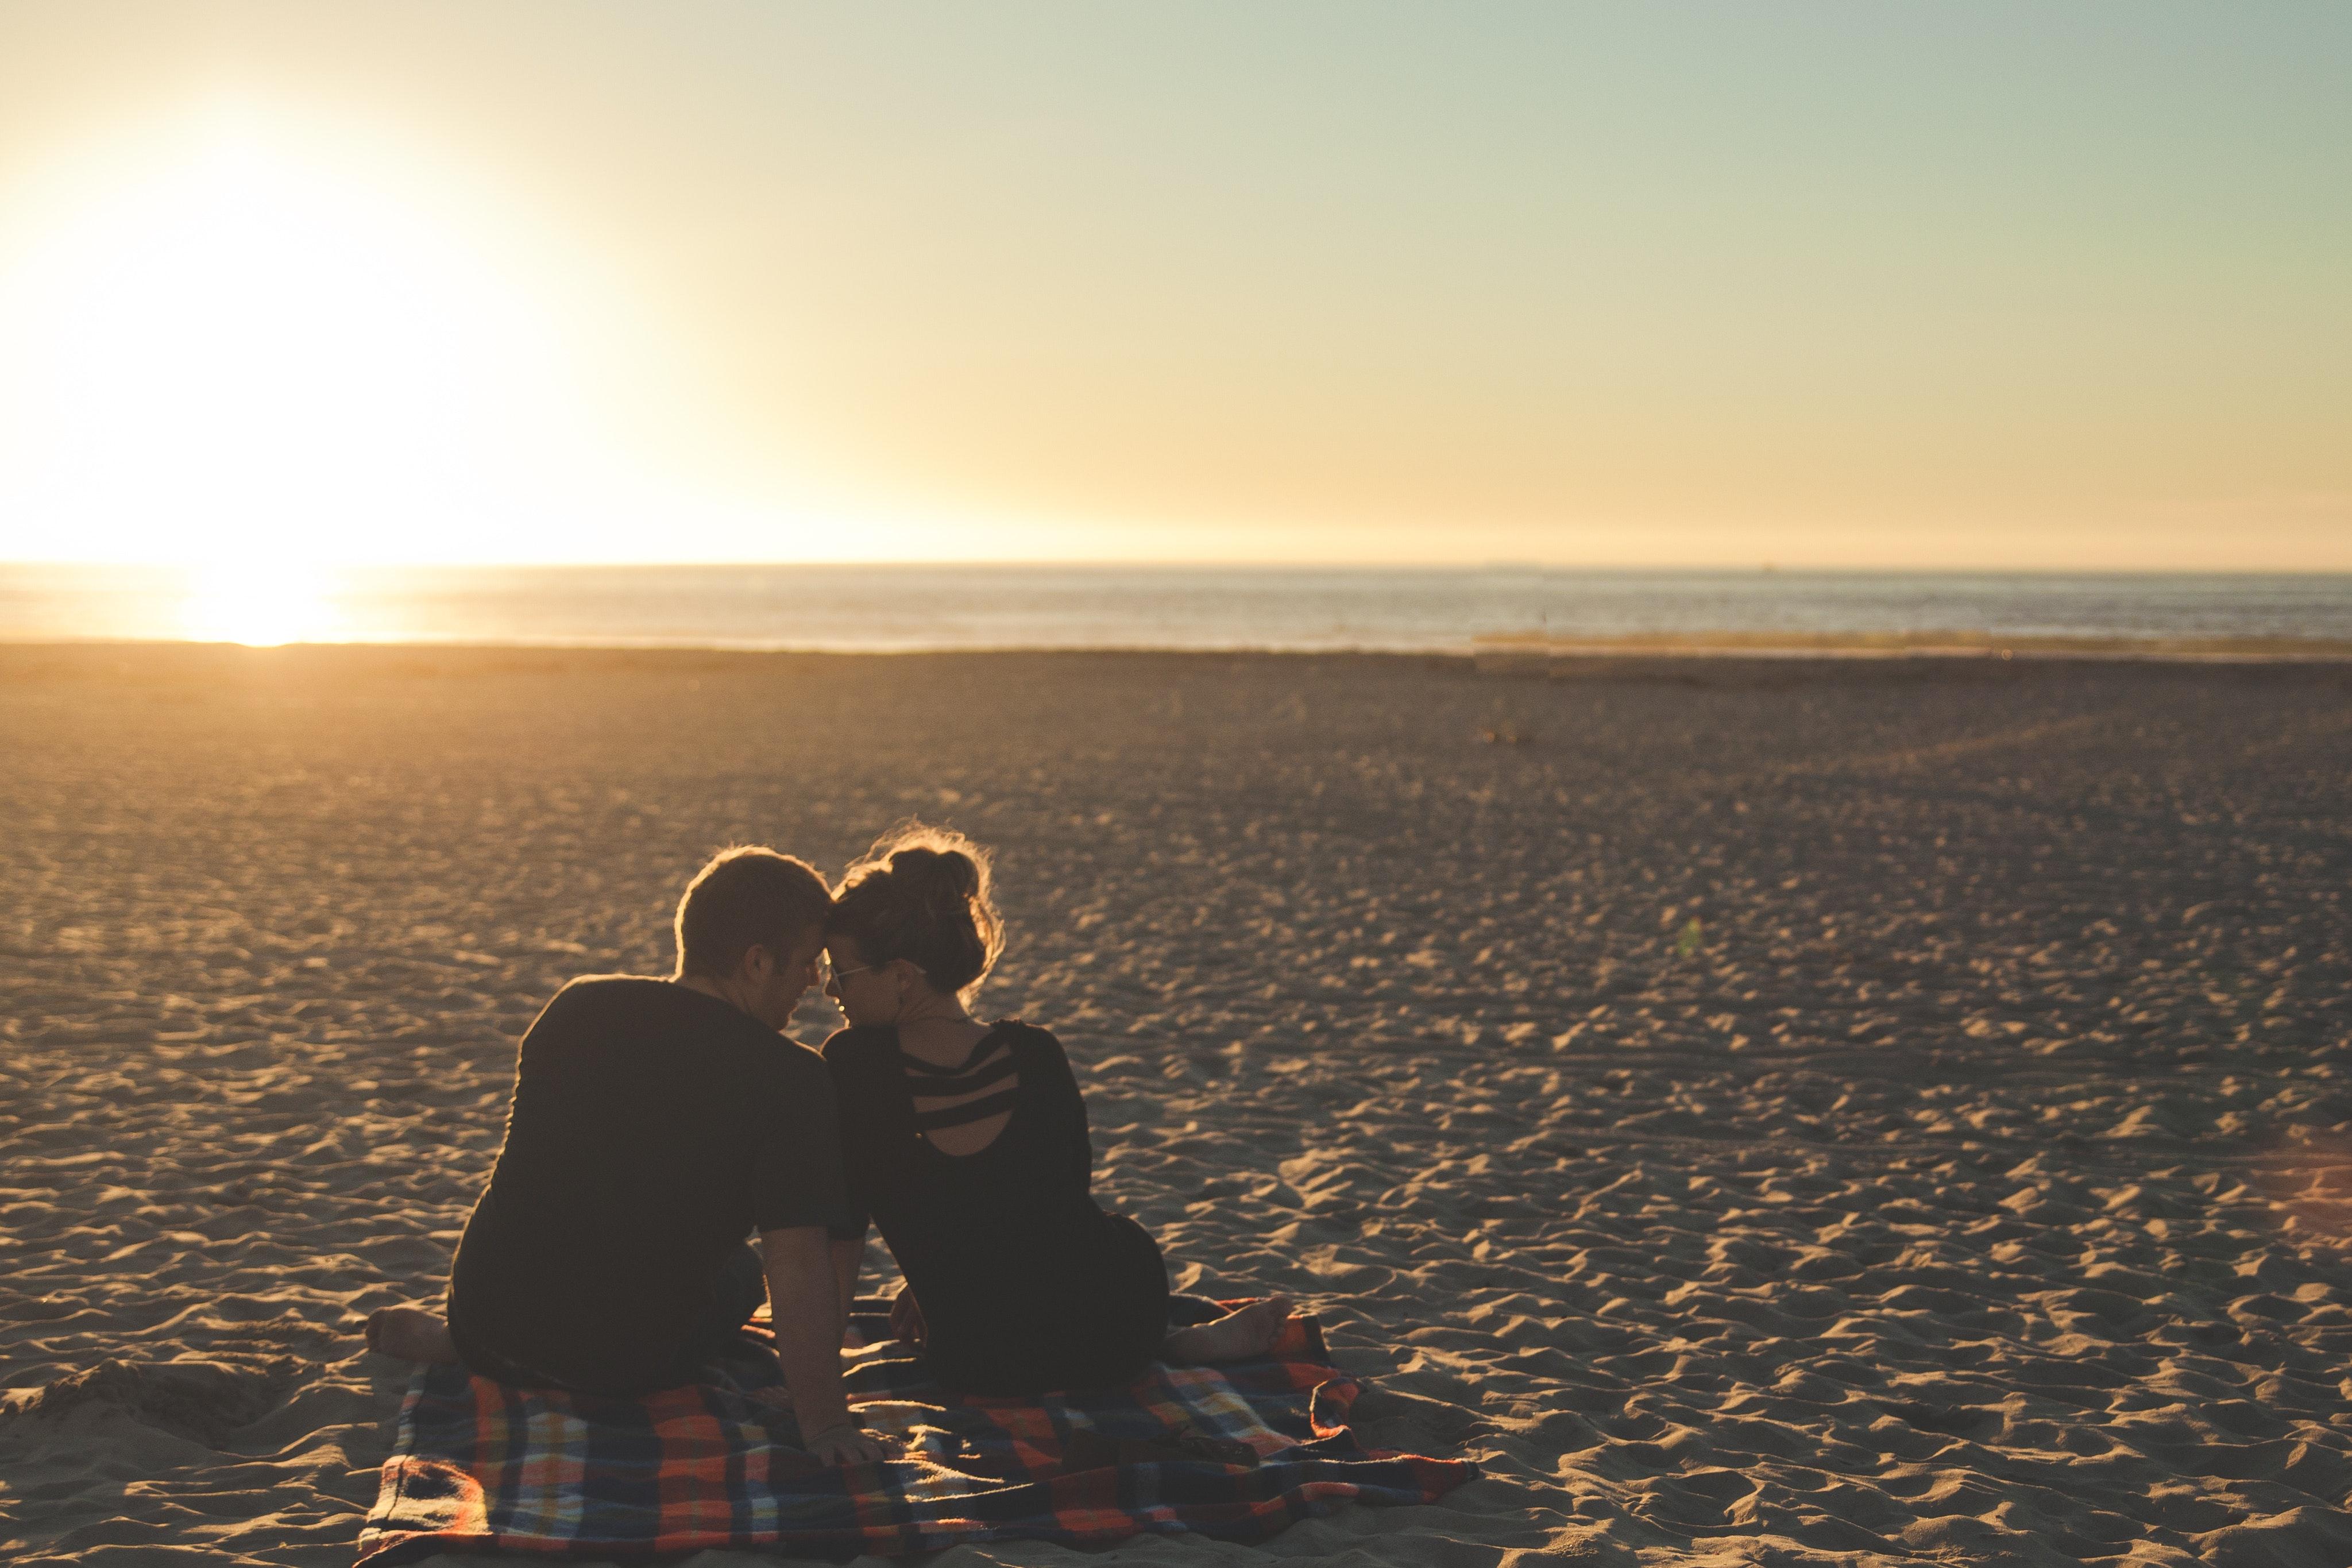 sunset-beach-couple-love-58572.jpg